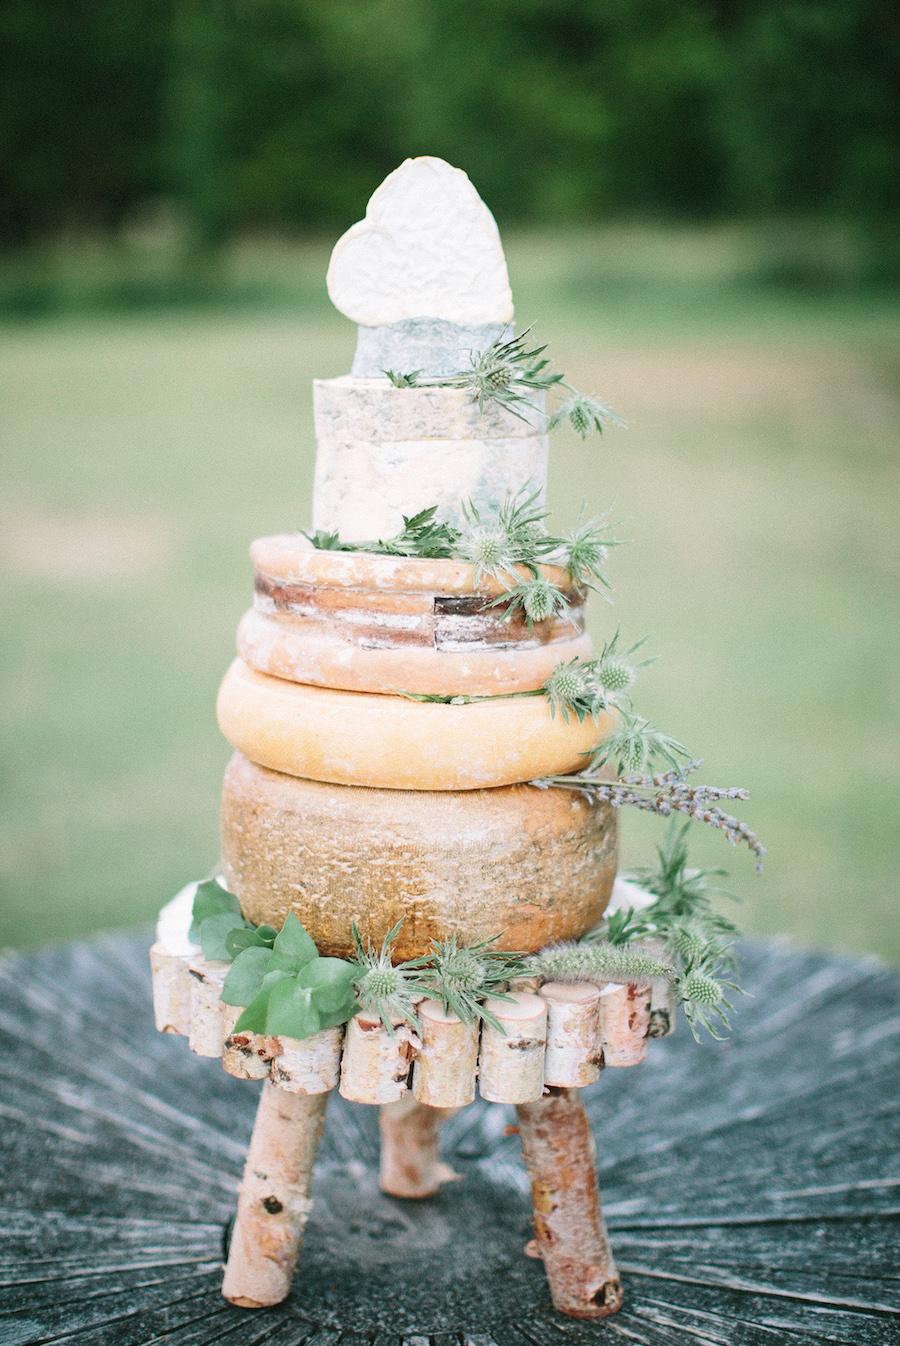 saya-photography-rustic-french-wedding-provence-domaines-de-patras-107.jpg